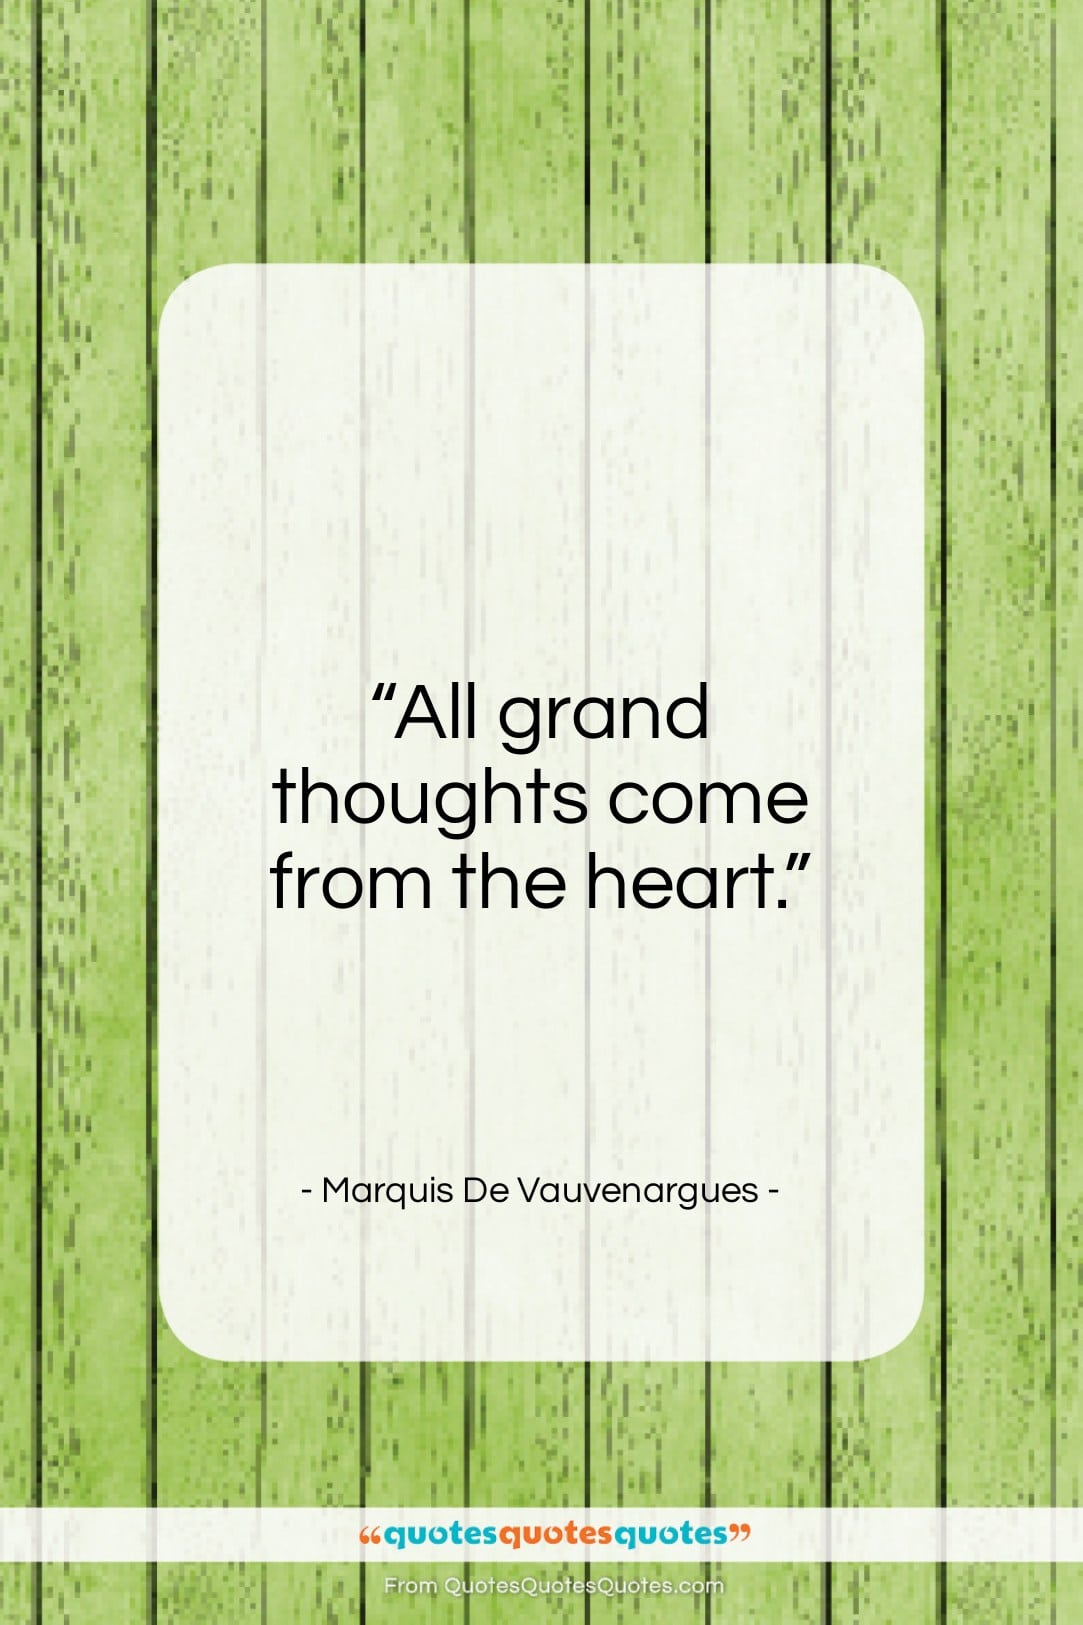 Get The Whole Marquis De Vauvenargues Quote All Grand Thoughts